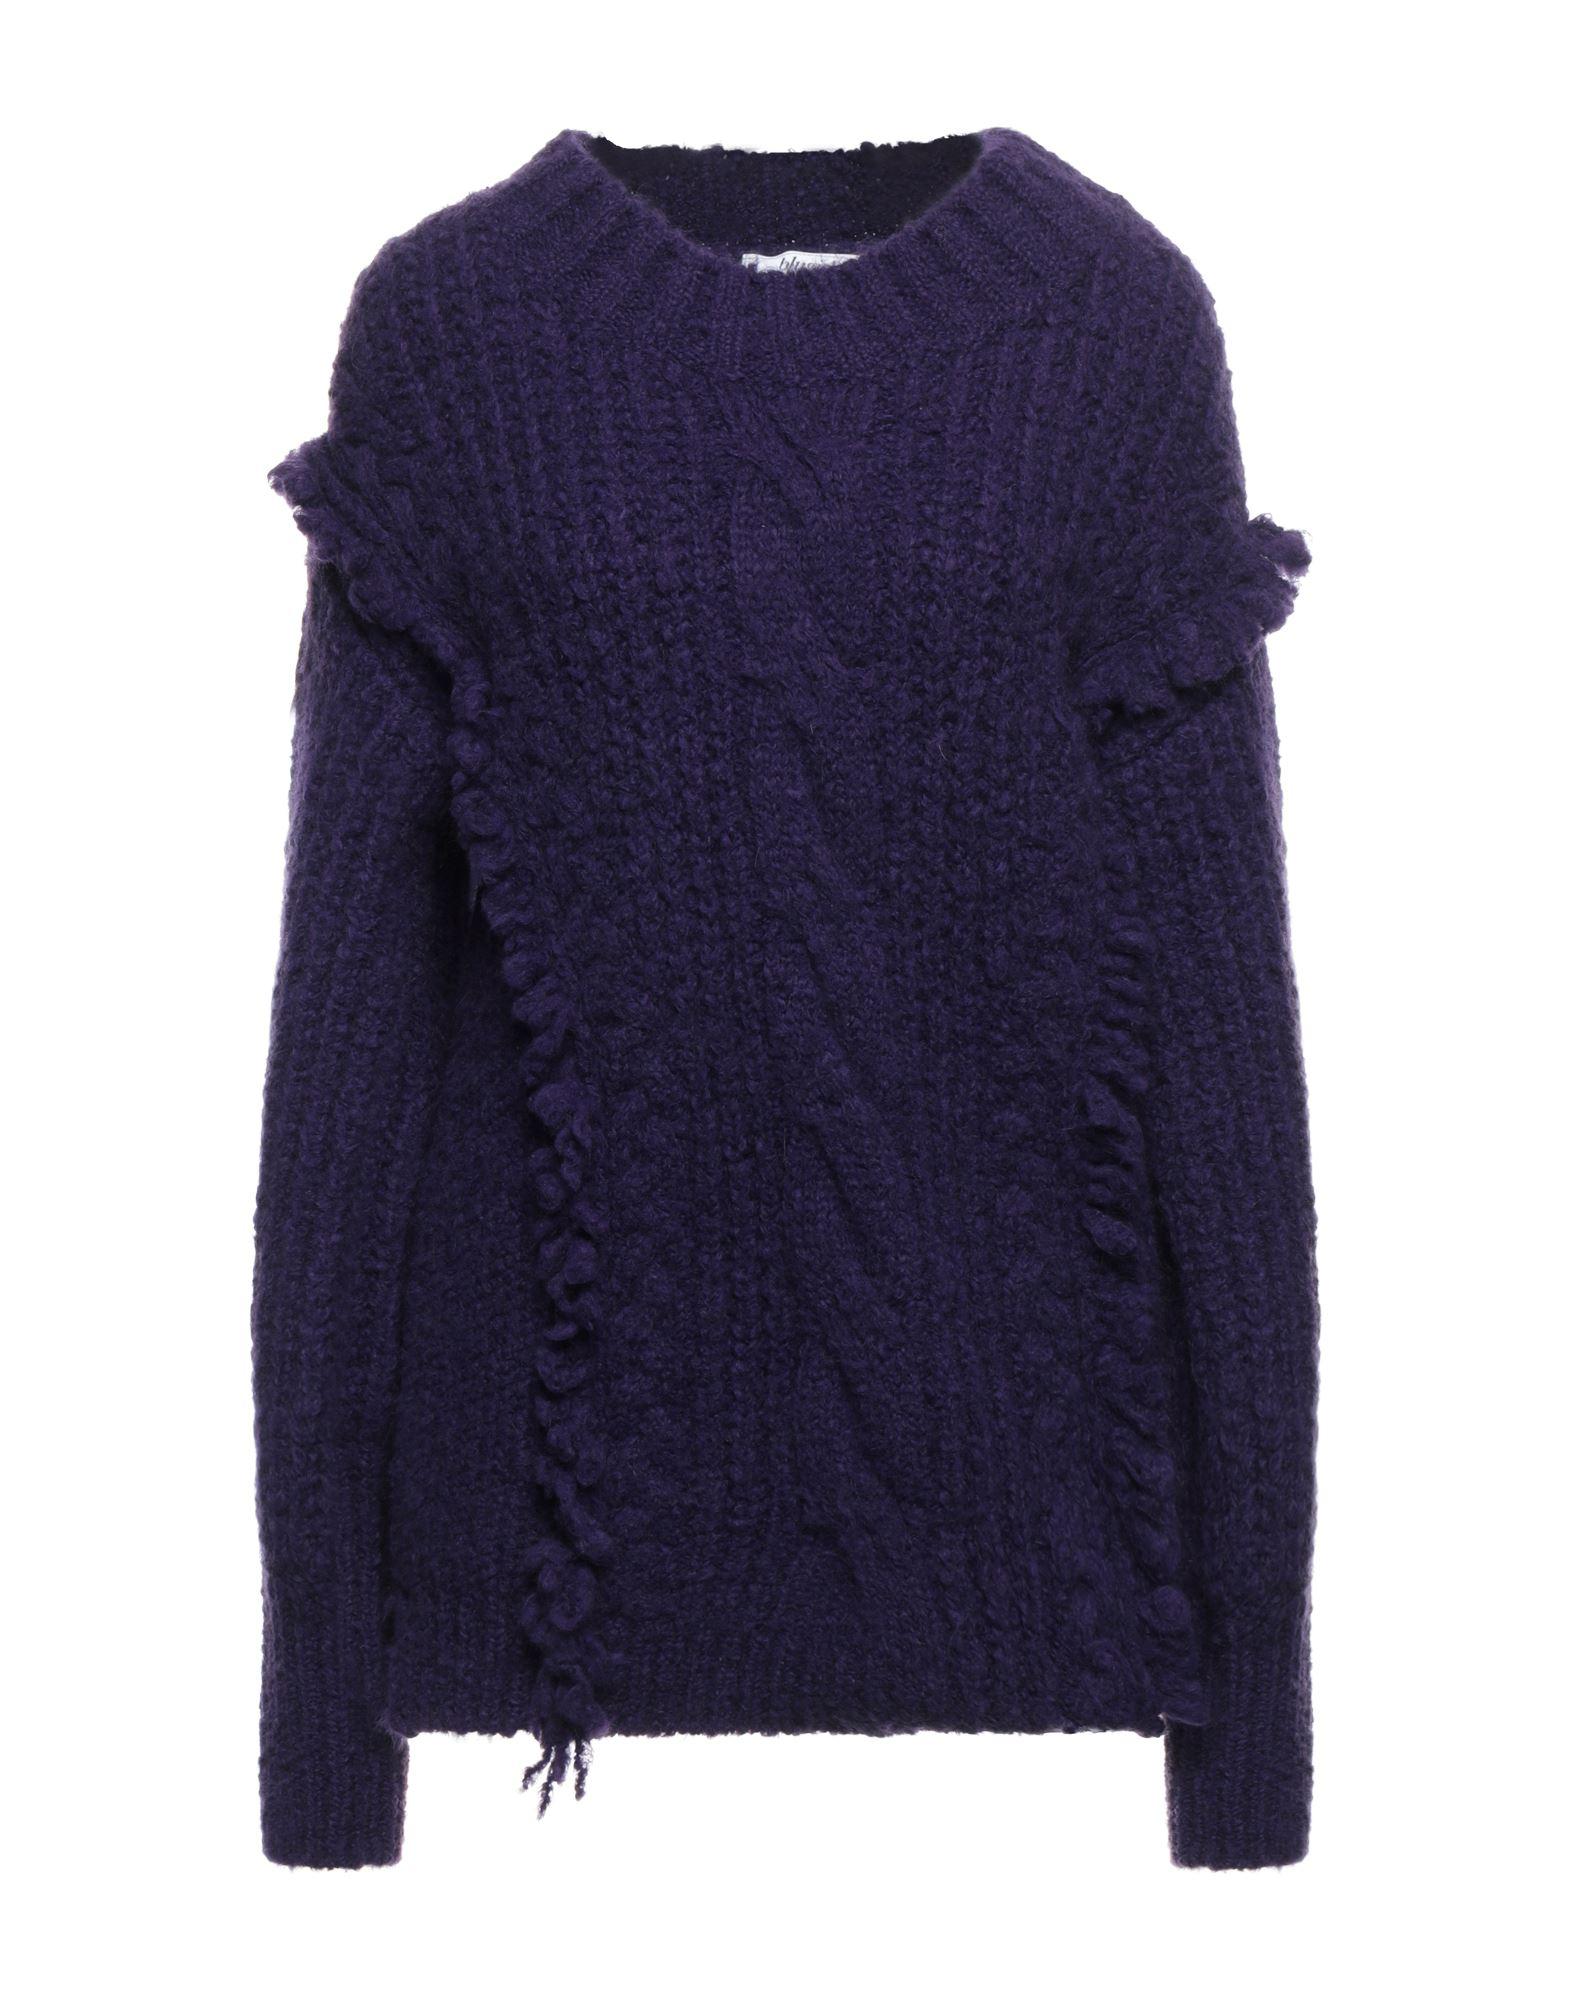 blumarine свитер BLUGIRL BLUMARINE Свитер